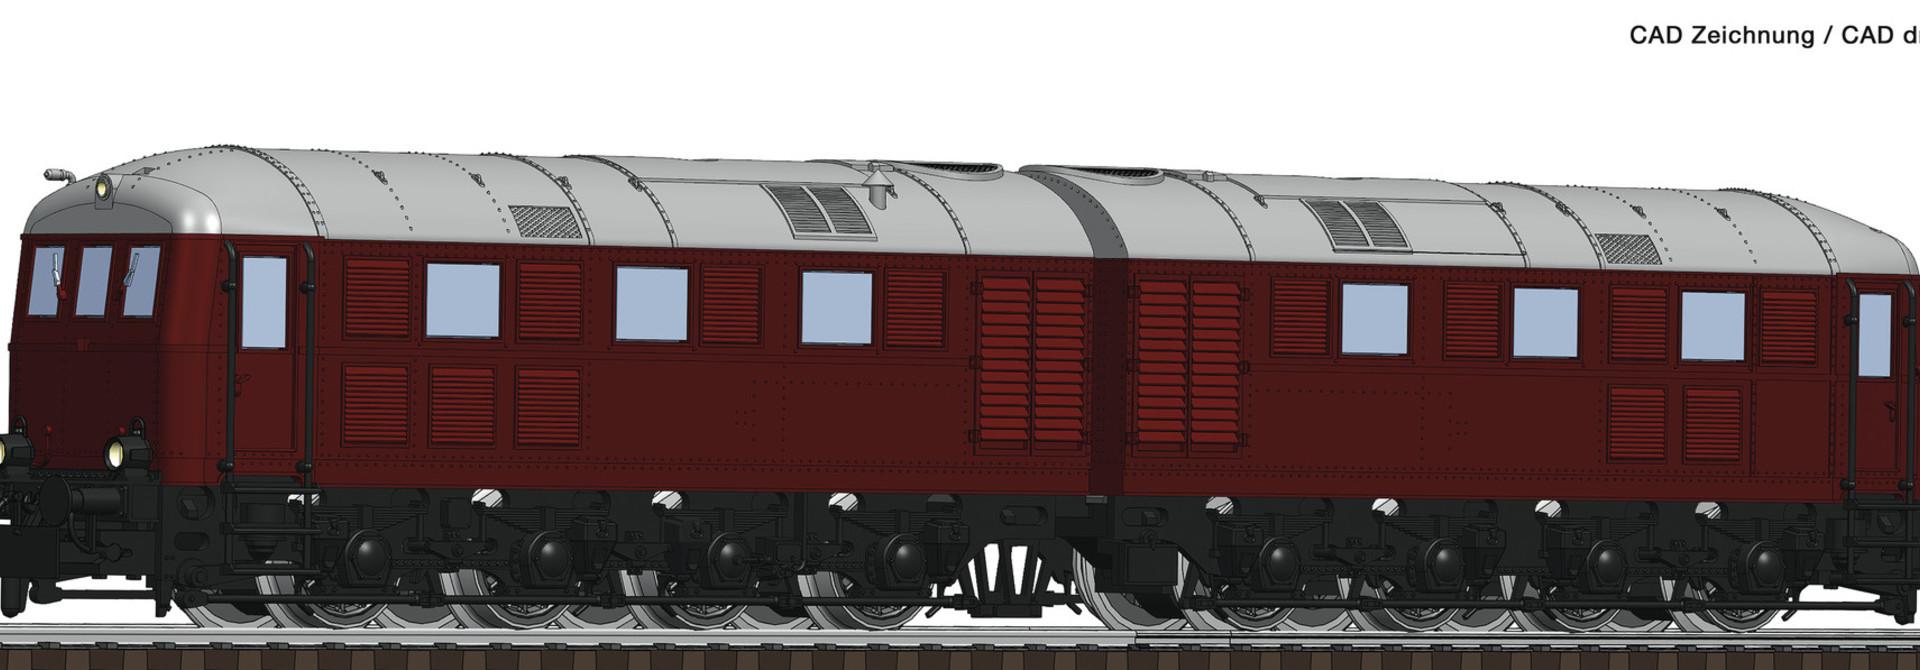 725100 Doppel-Diesellok BR288 rt.